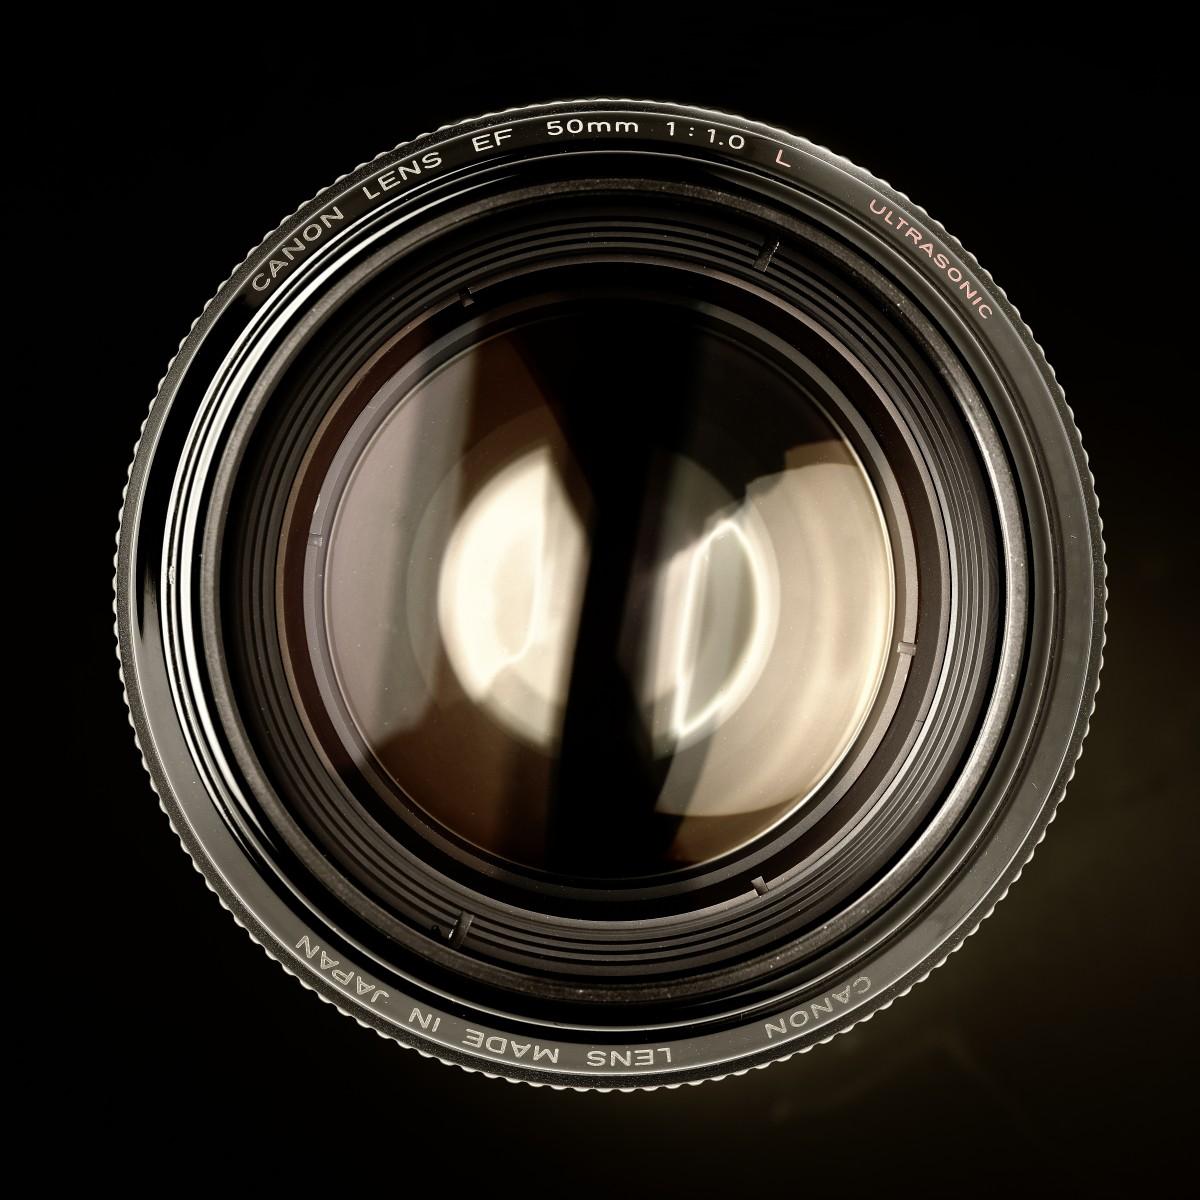 светильник в форме объектива фотоаппарата коллекции